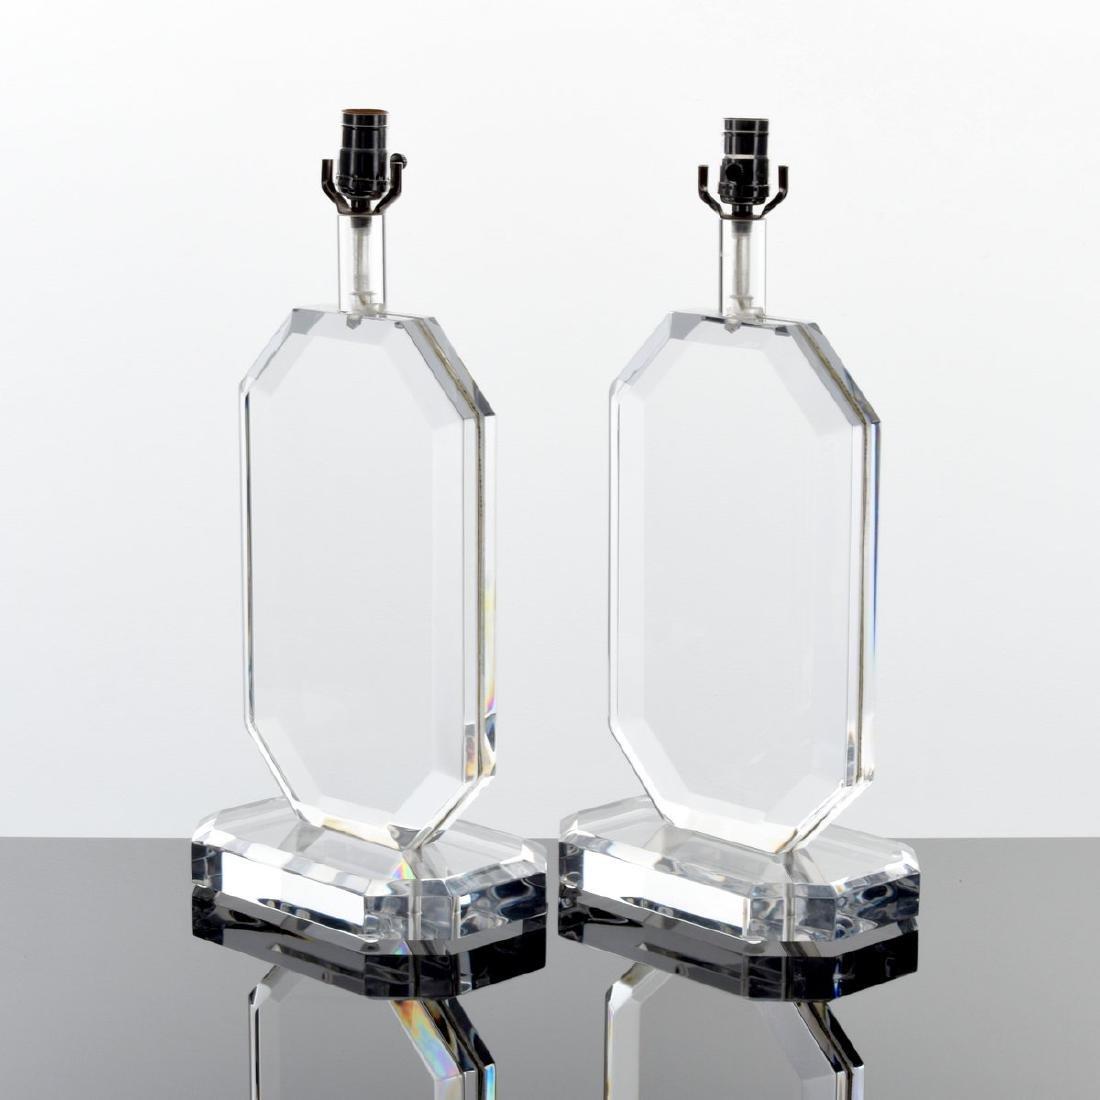 Pair of Lucite Lamps, Manner of Karl Springer